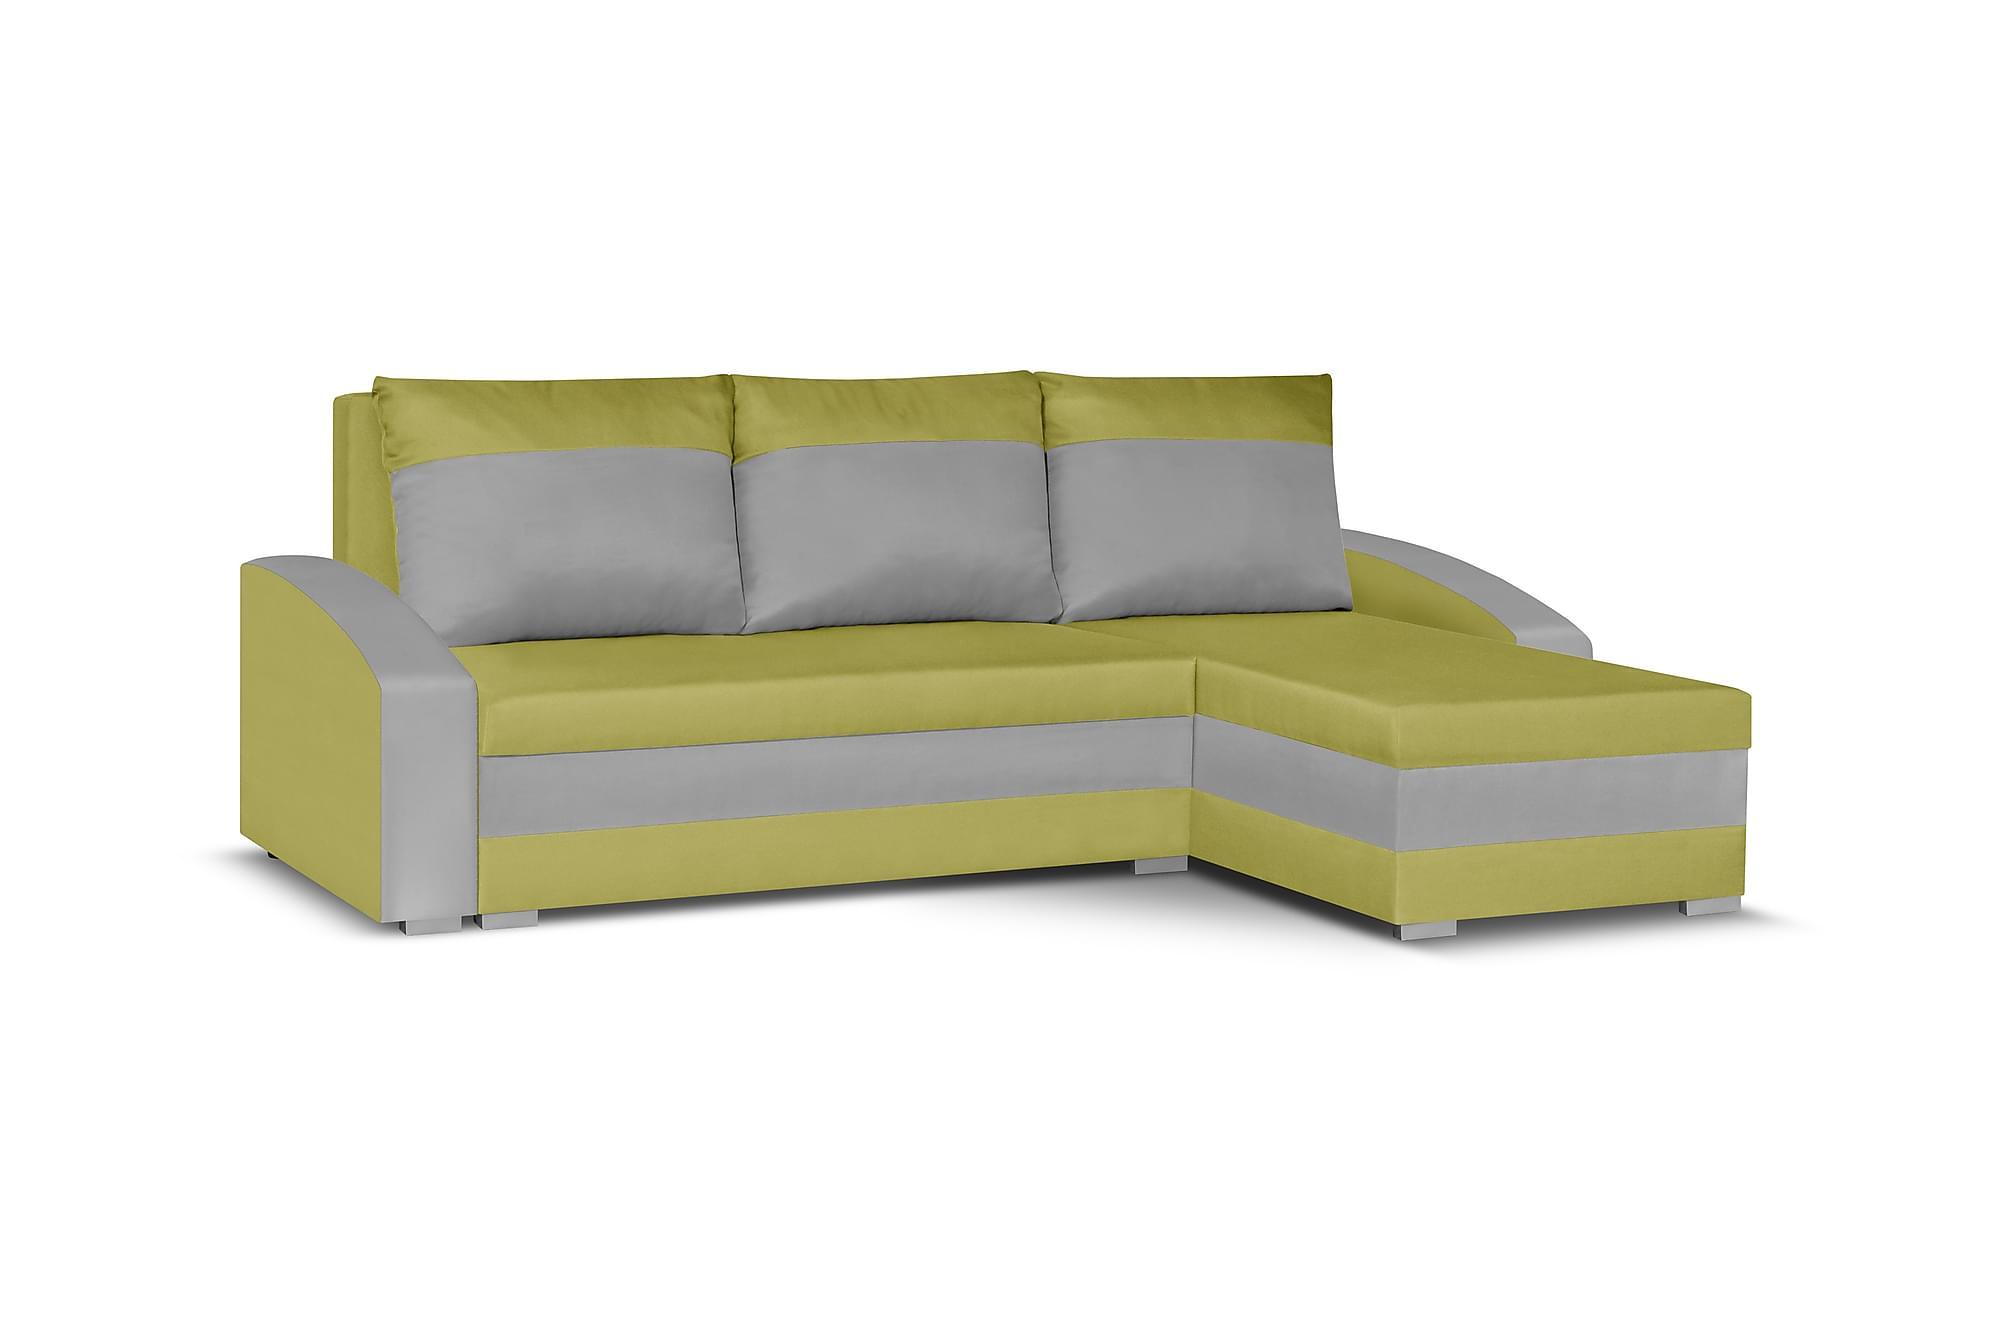 Banyoles divanbäddsoffa grön/grå